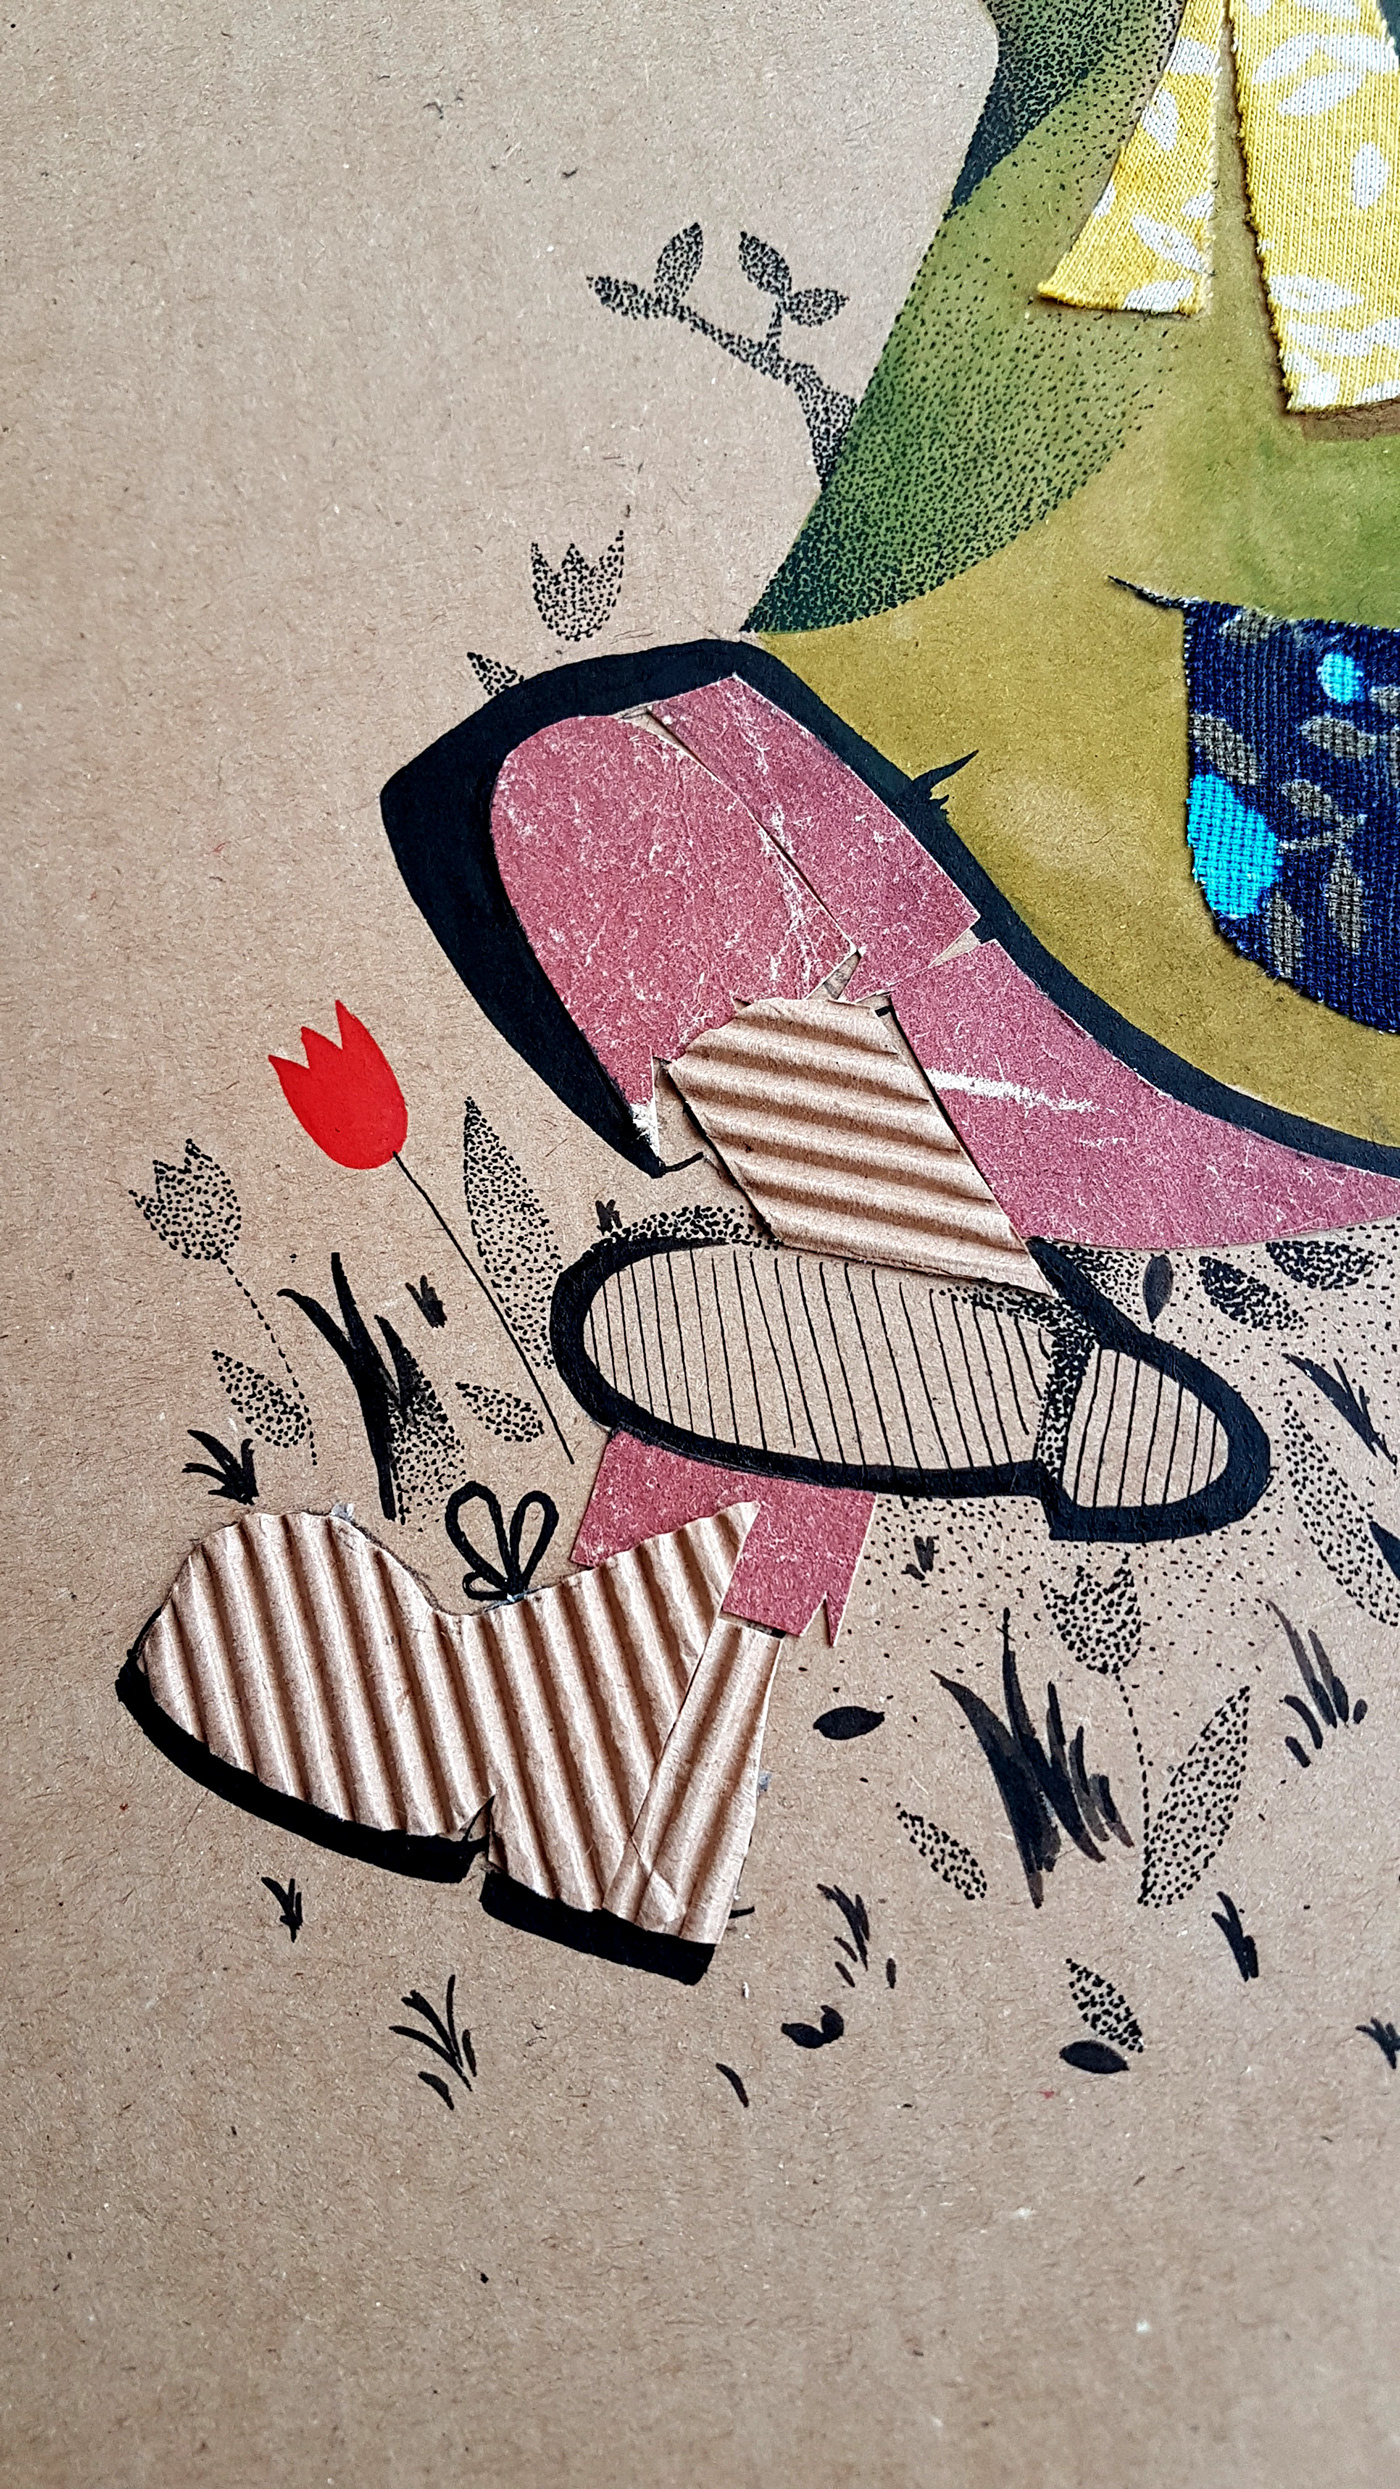 Snufkin moomin cartoon collage patchwork ILLUSTRATION  ink dotwork